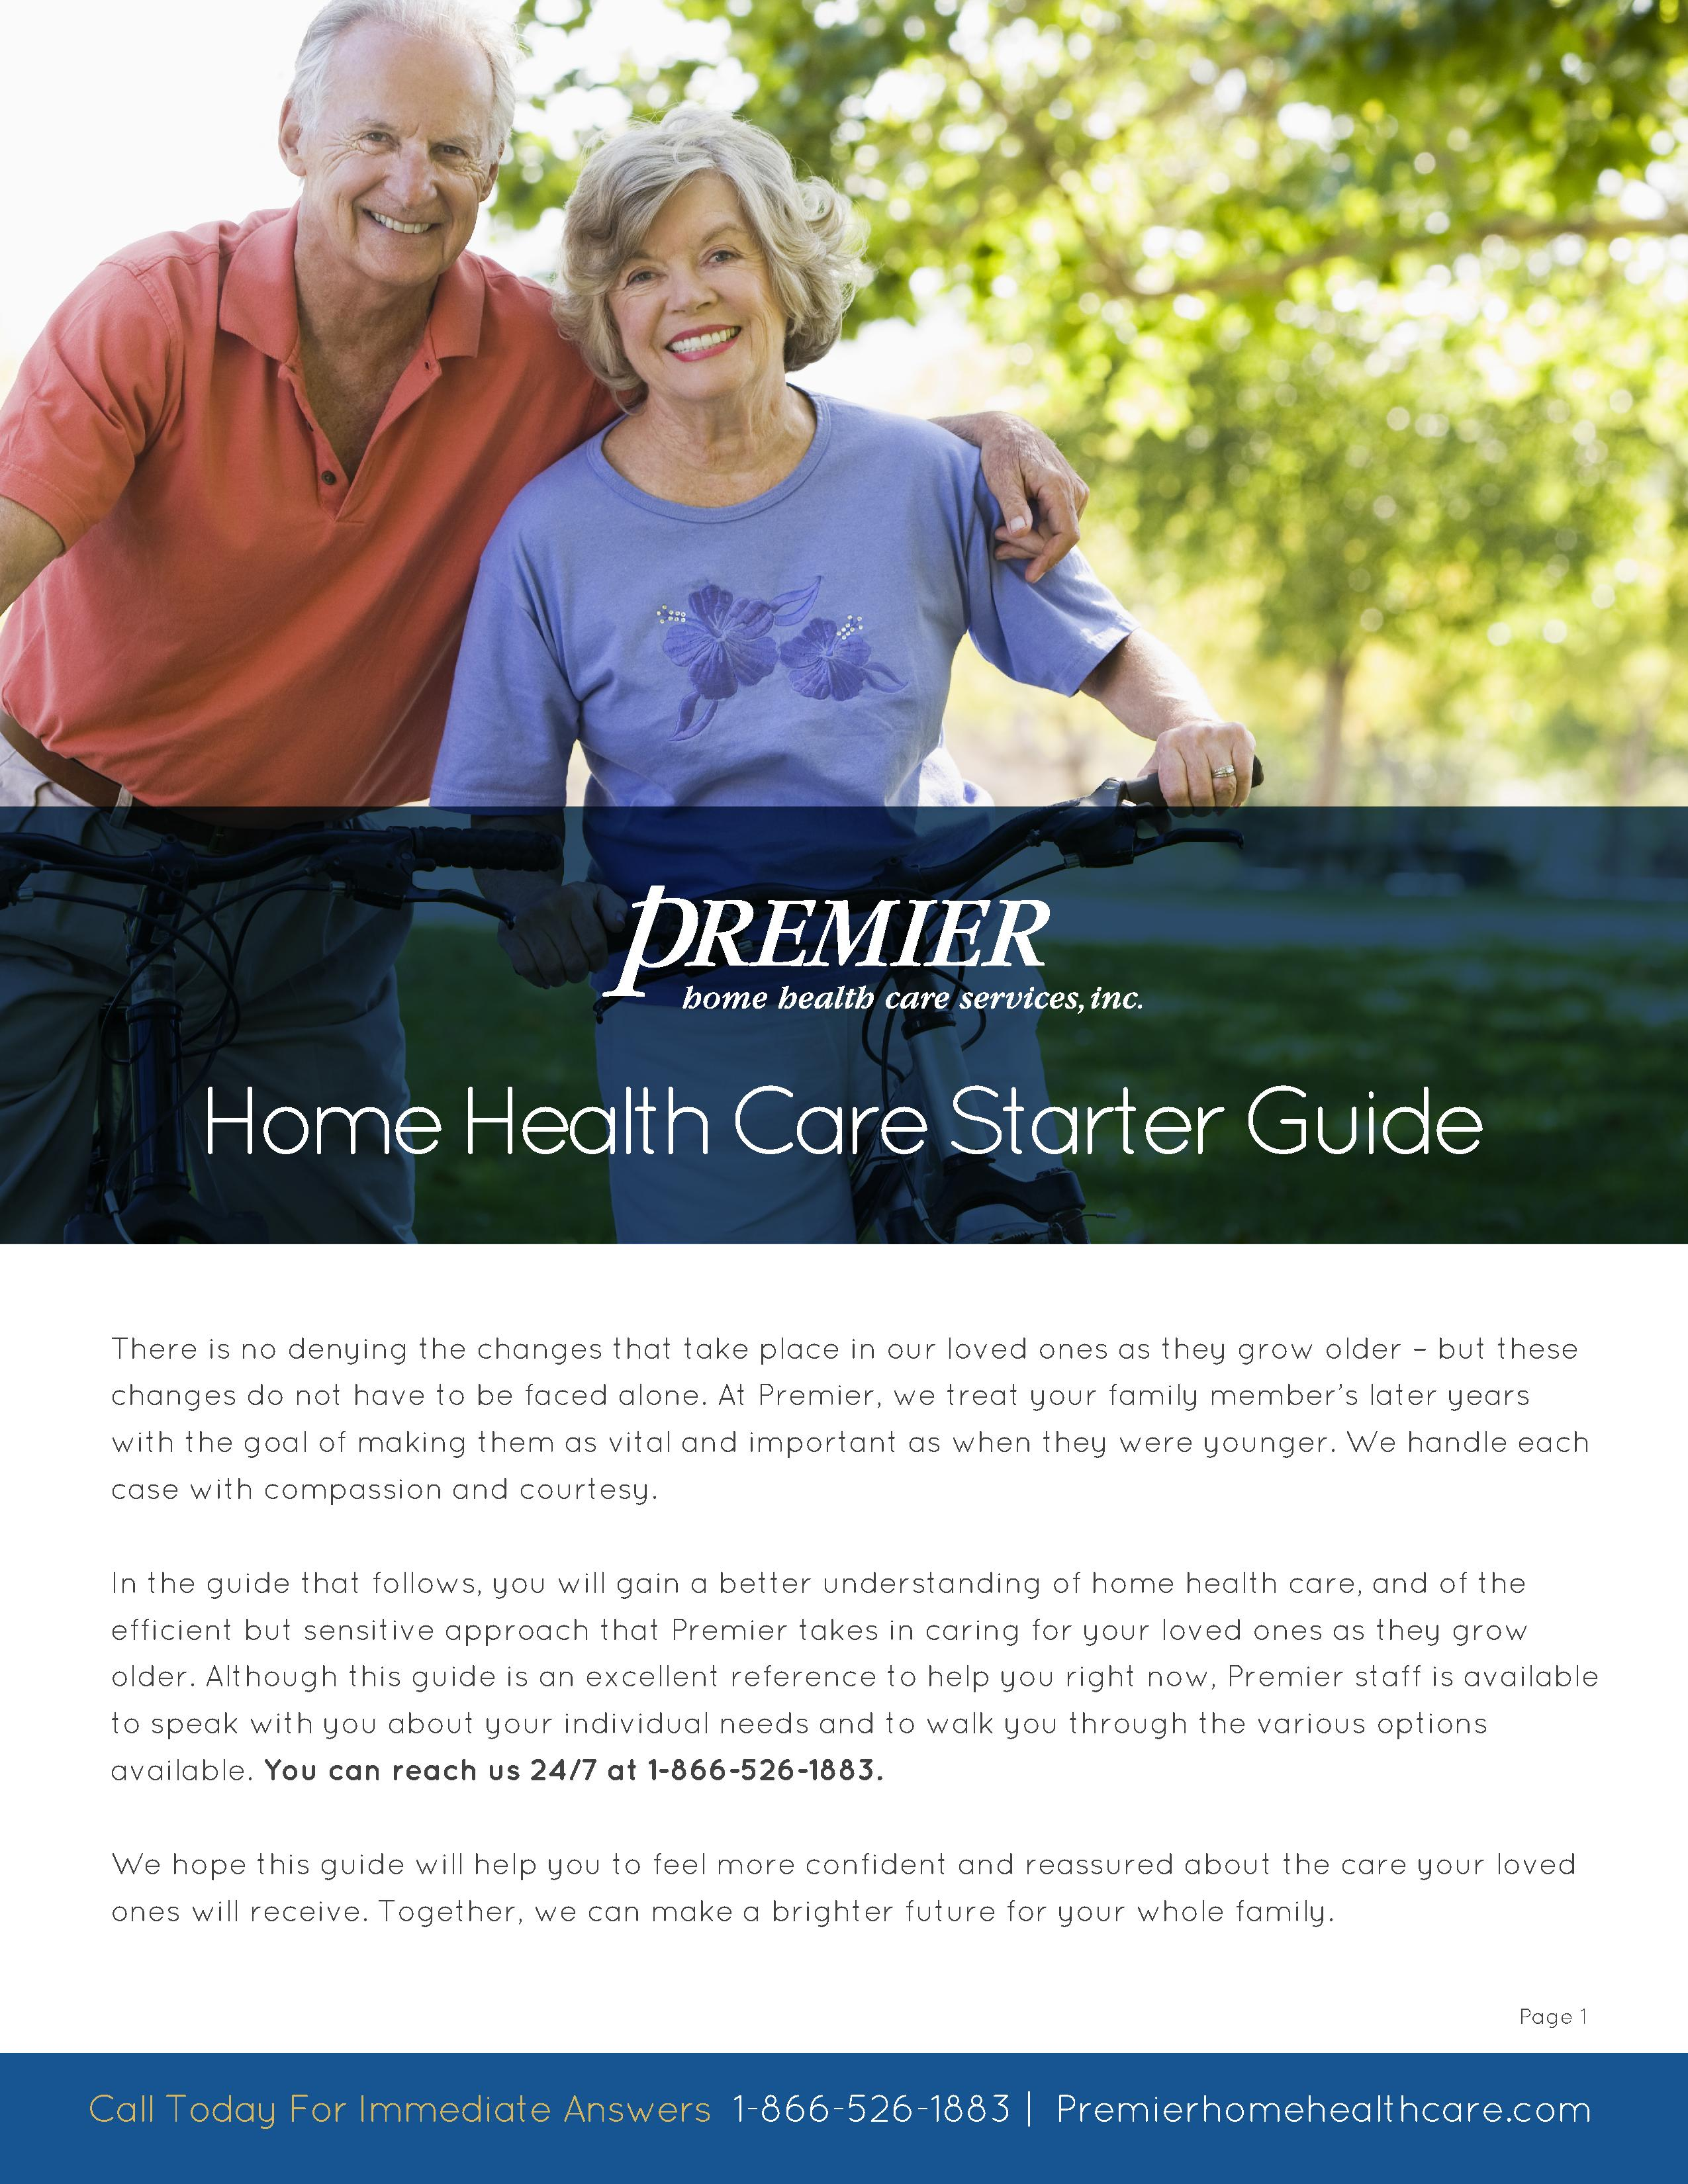 Home Health Care Starter Guide